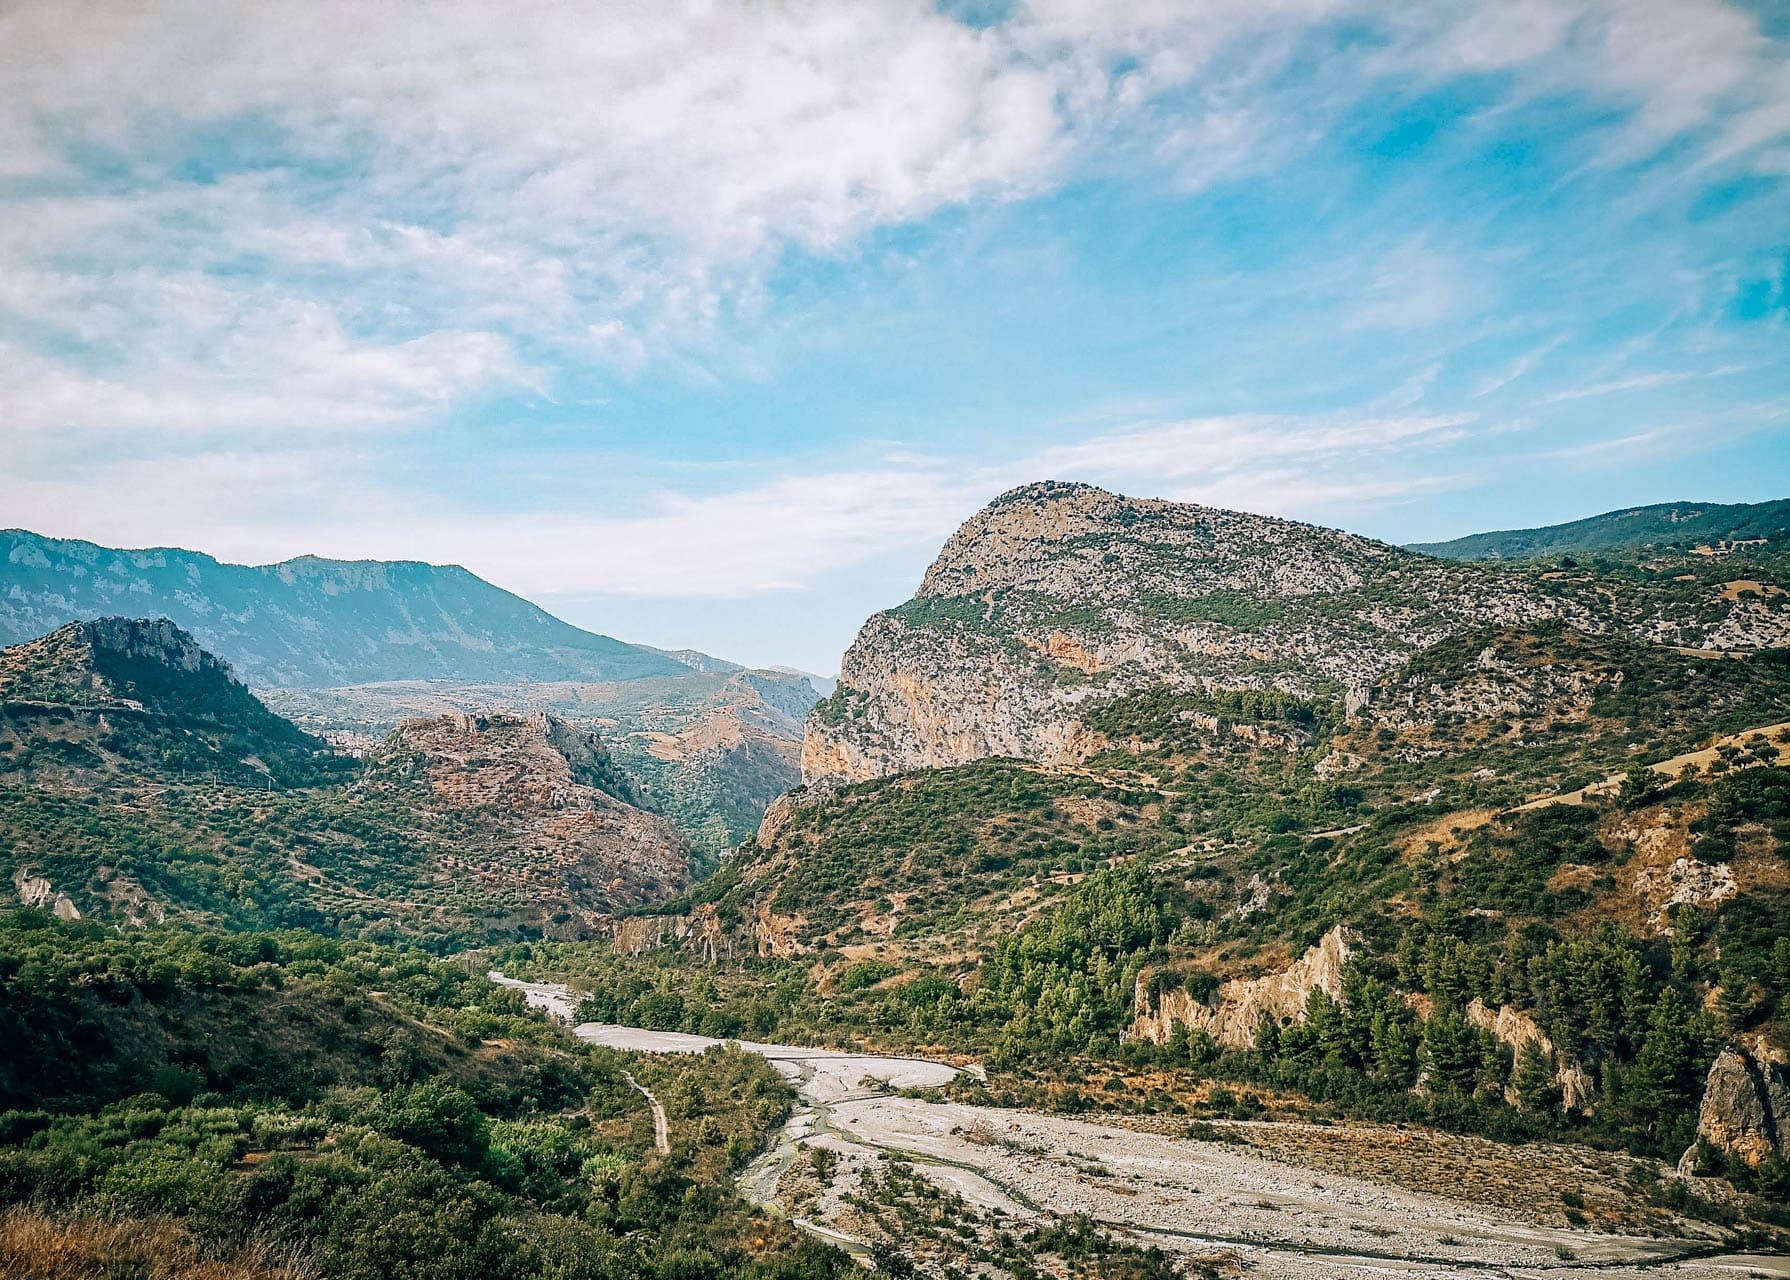 canyon parco nazionale del pollino